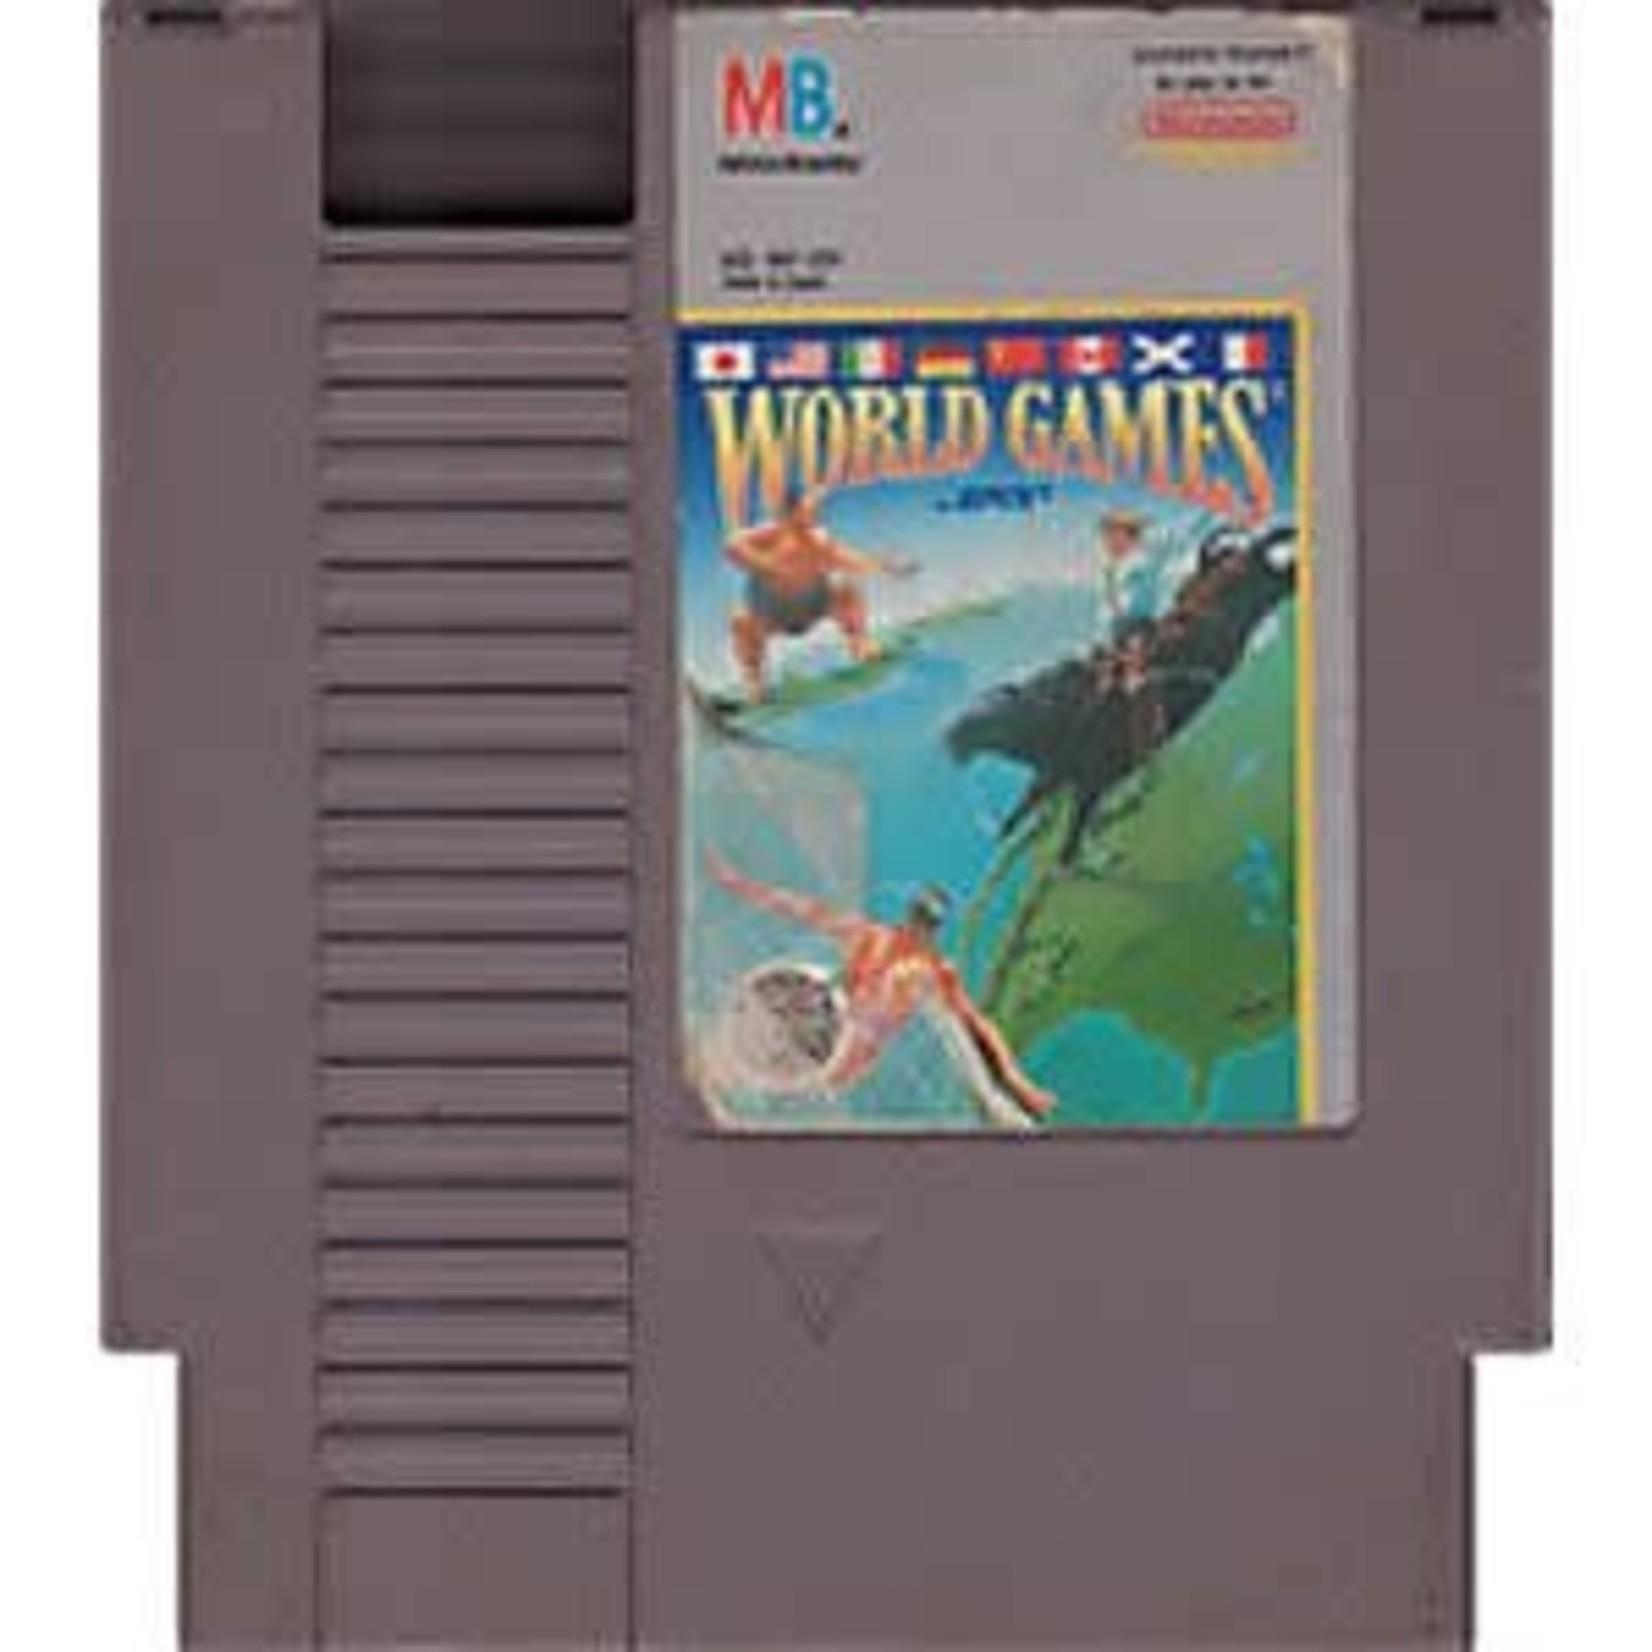 World Games (NES)